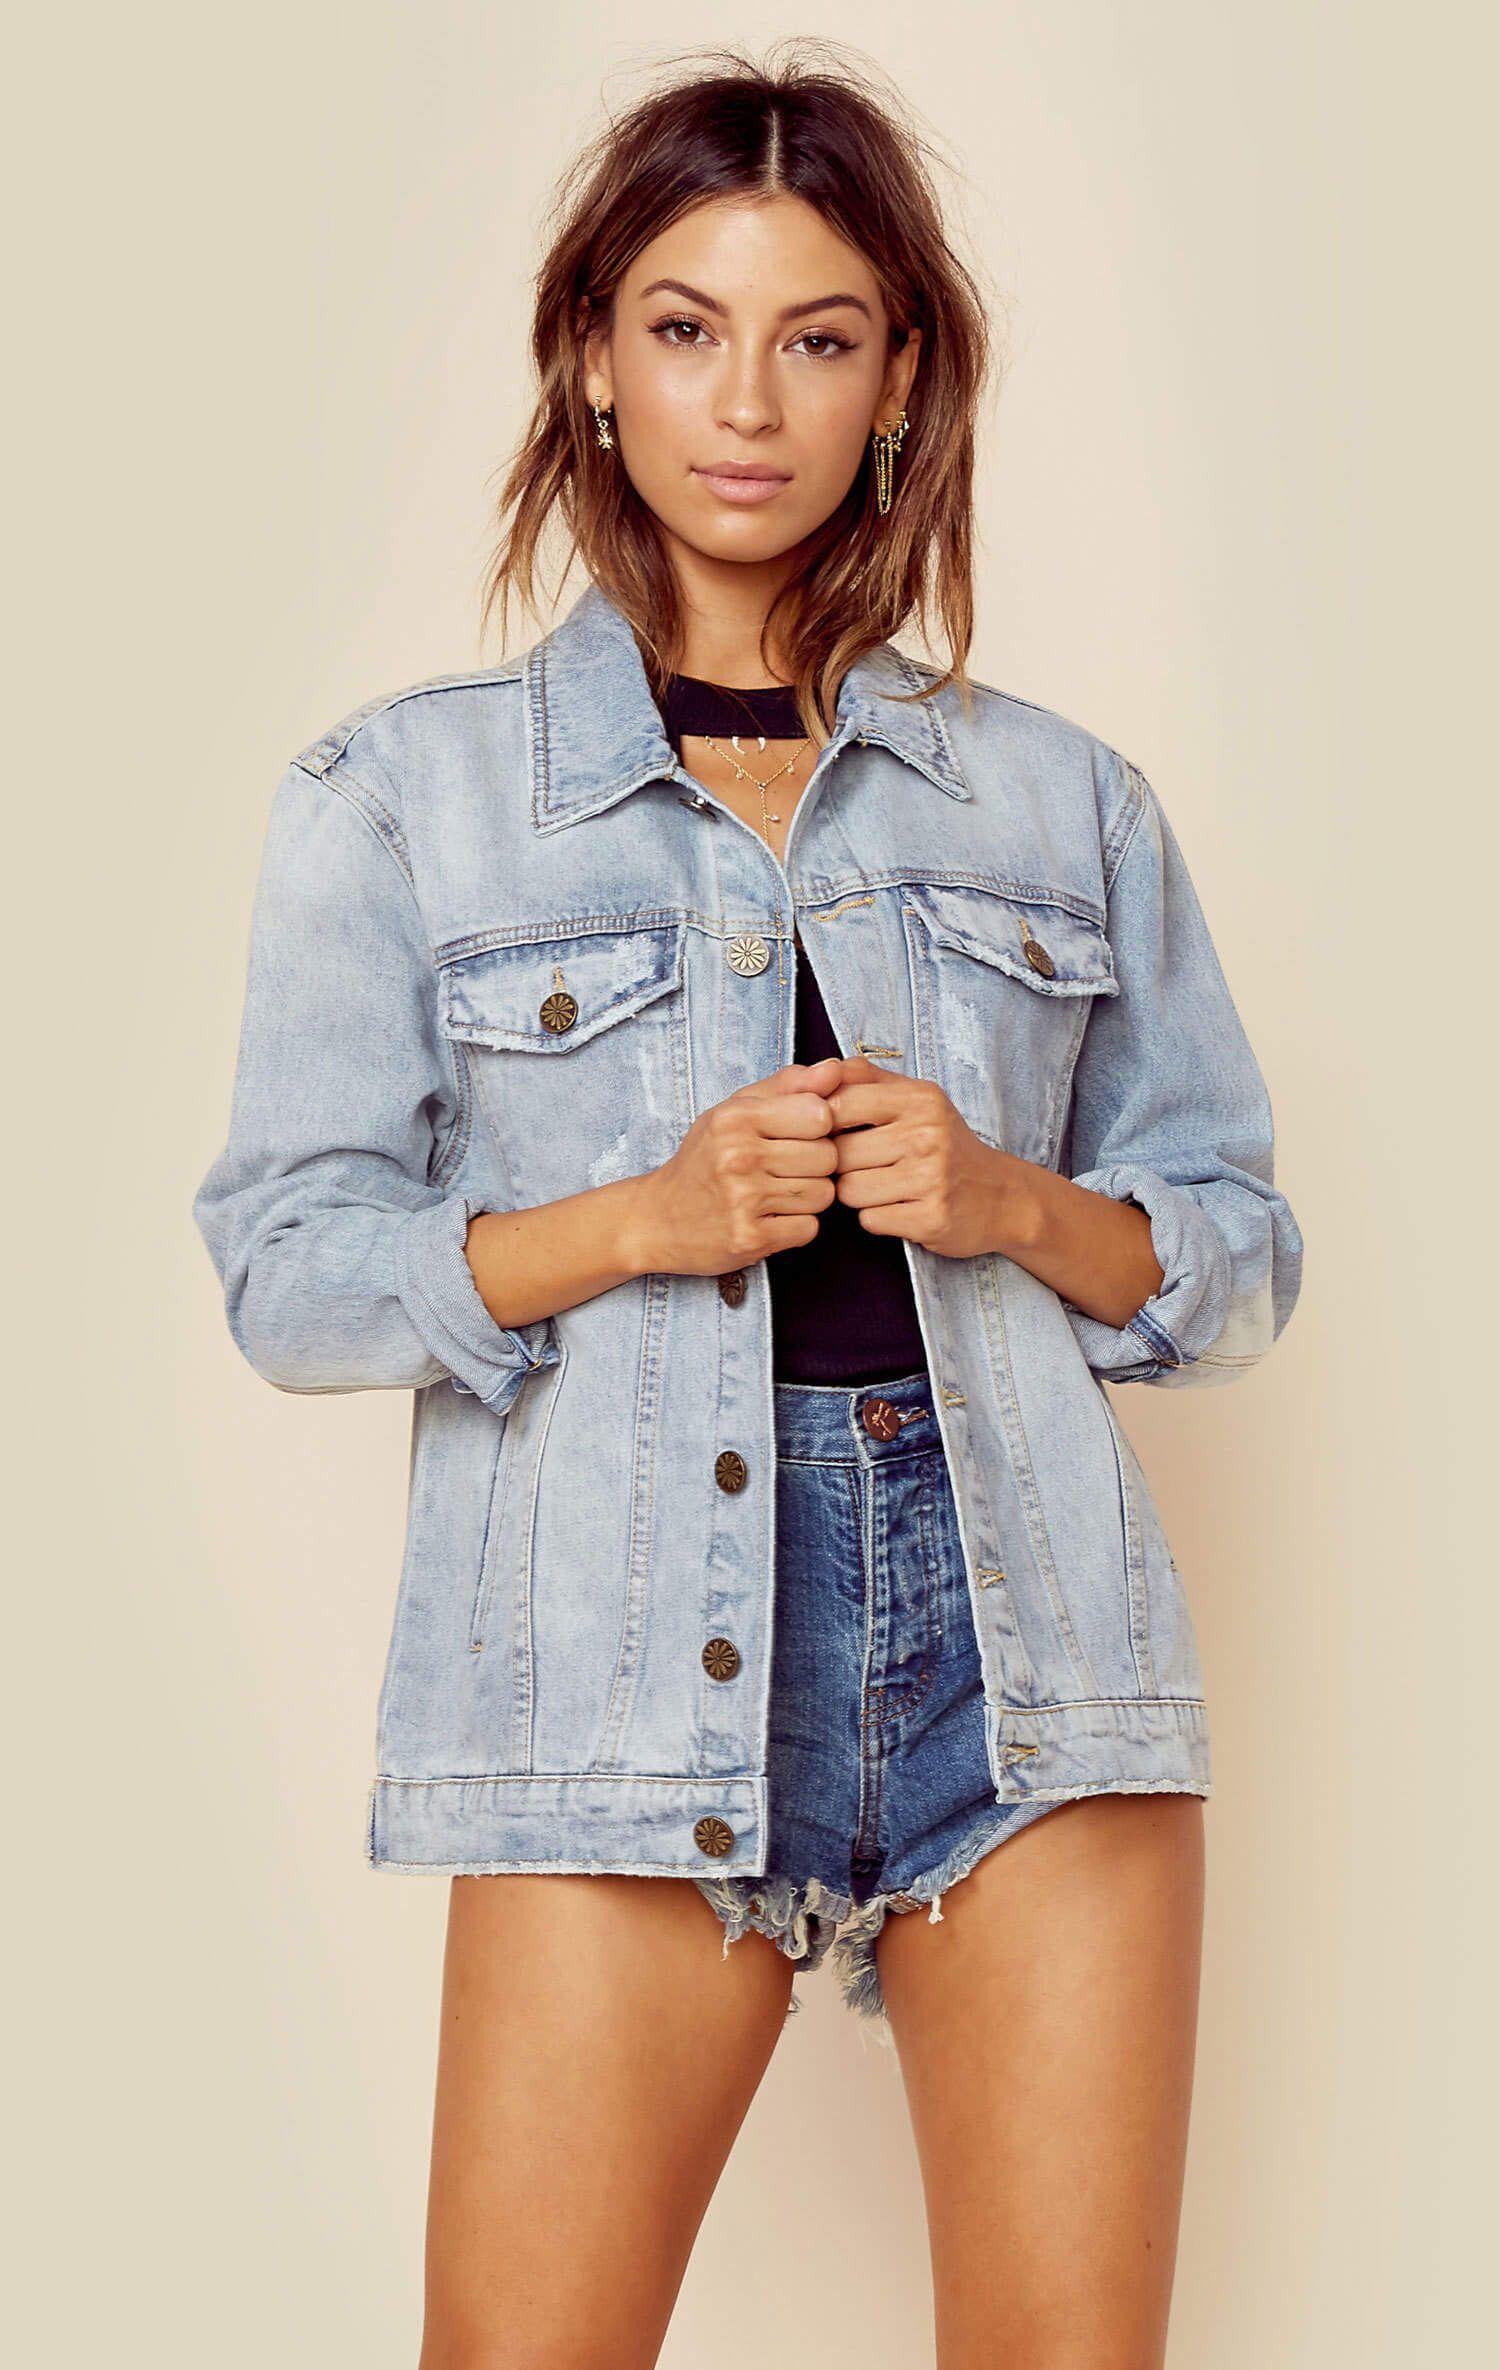 Drine denim jacket denim jackets california girl style and clothes